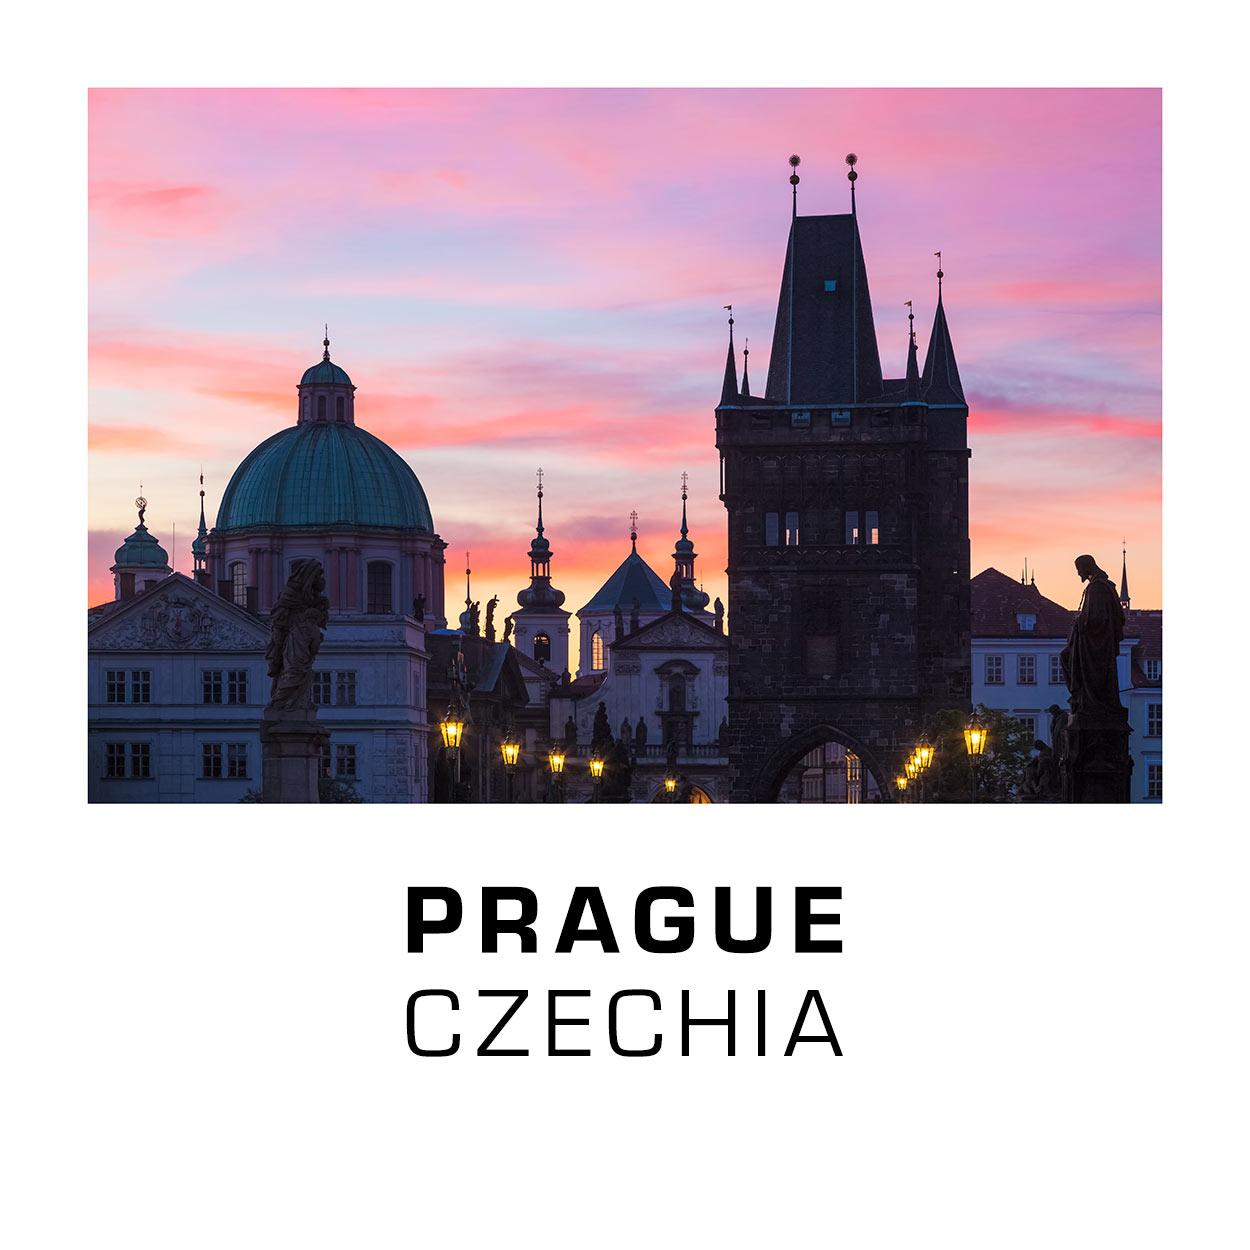 Prague, Czechia - Sunrise on Charles Bridge